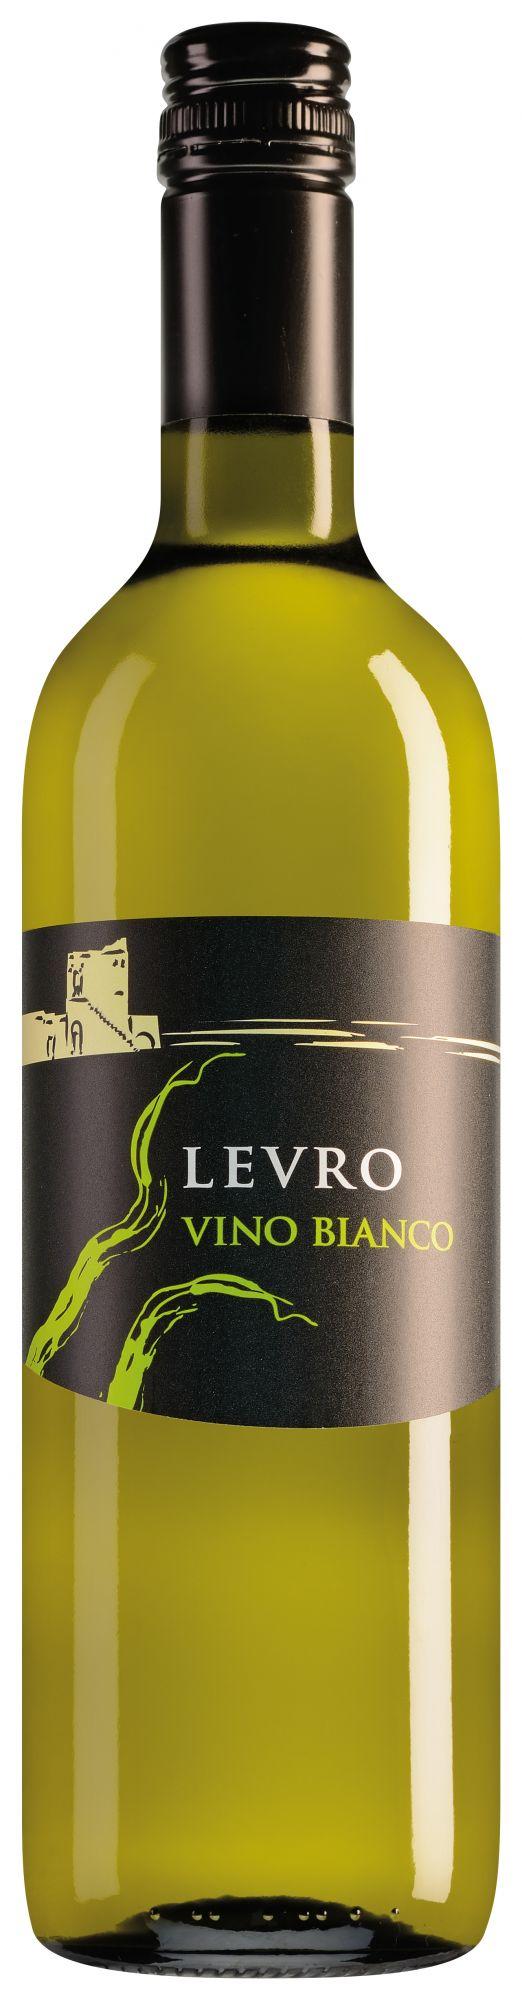 Cantine Due Palme Salento Levro Chardonnay